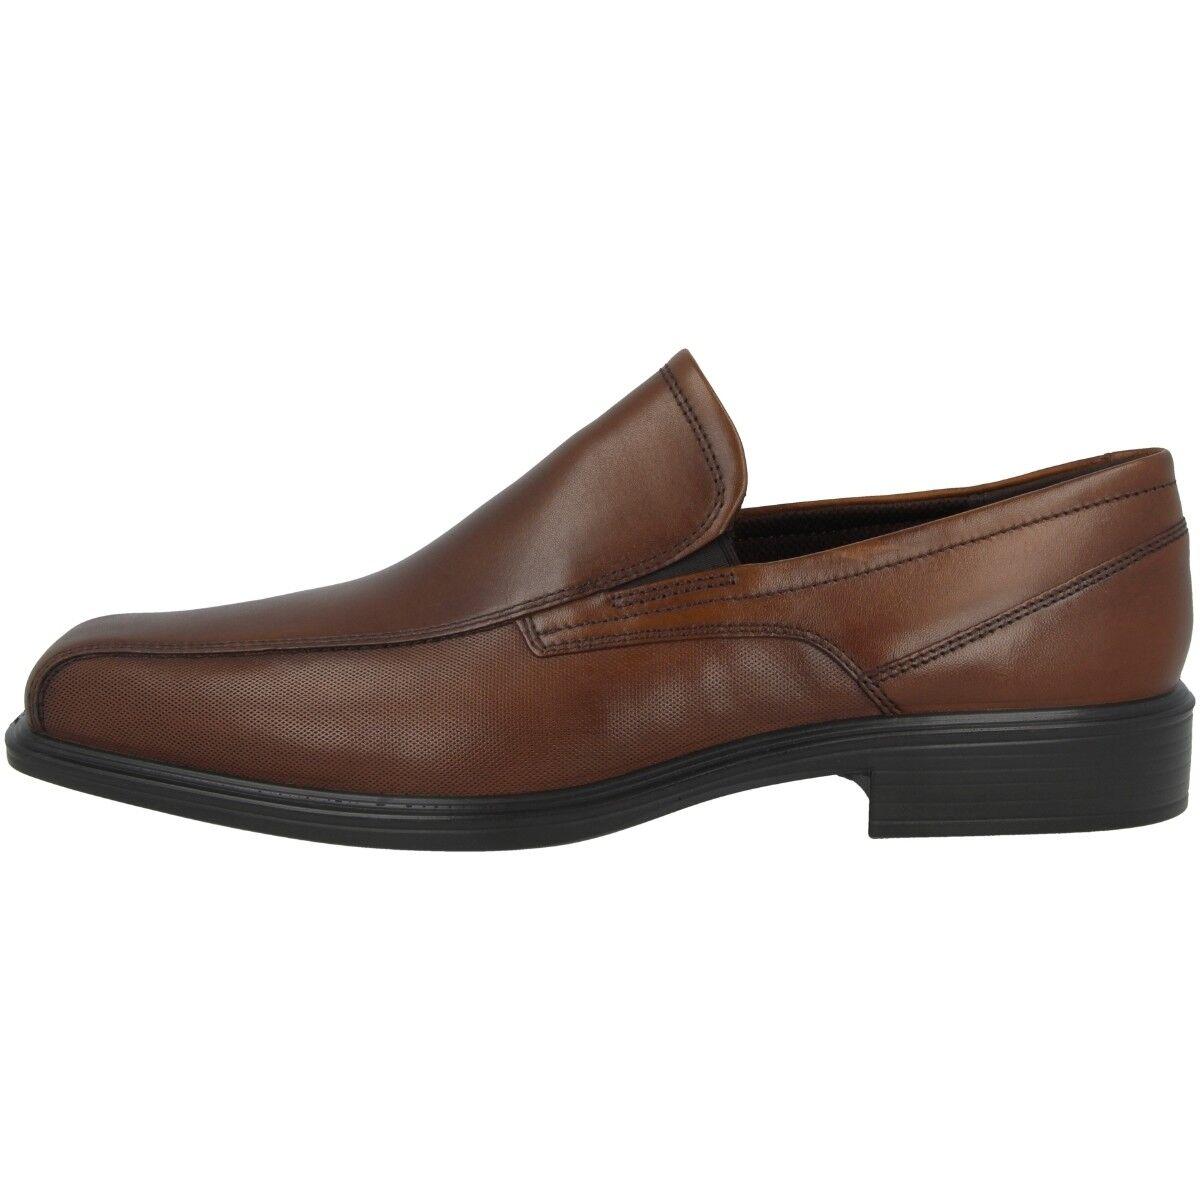 Ecco Johannesburg Halbschuhe Men Schuhe Herren Halbschuhe Johannesburg Business cognac 623514-01053 8f3e7b